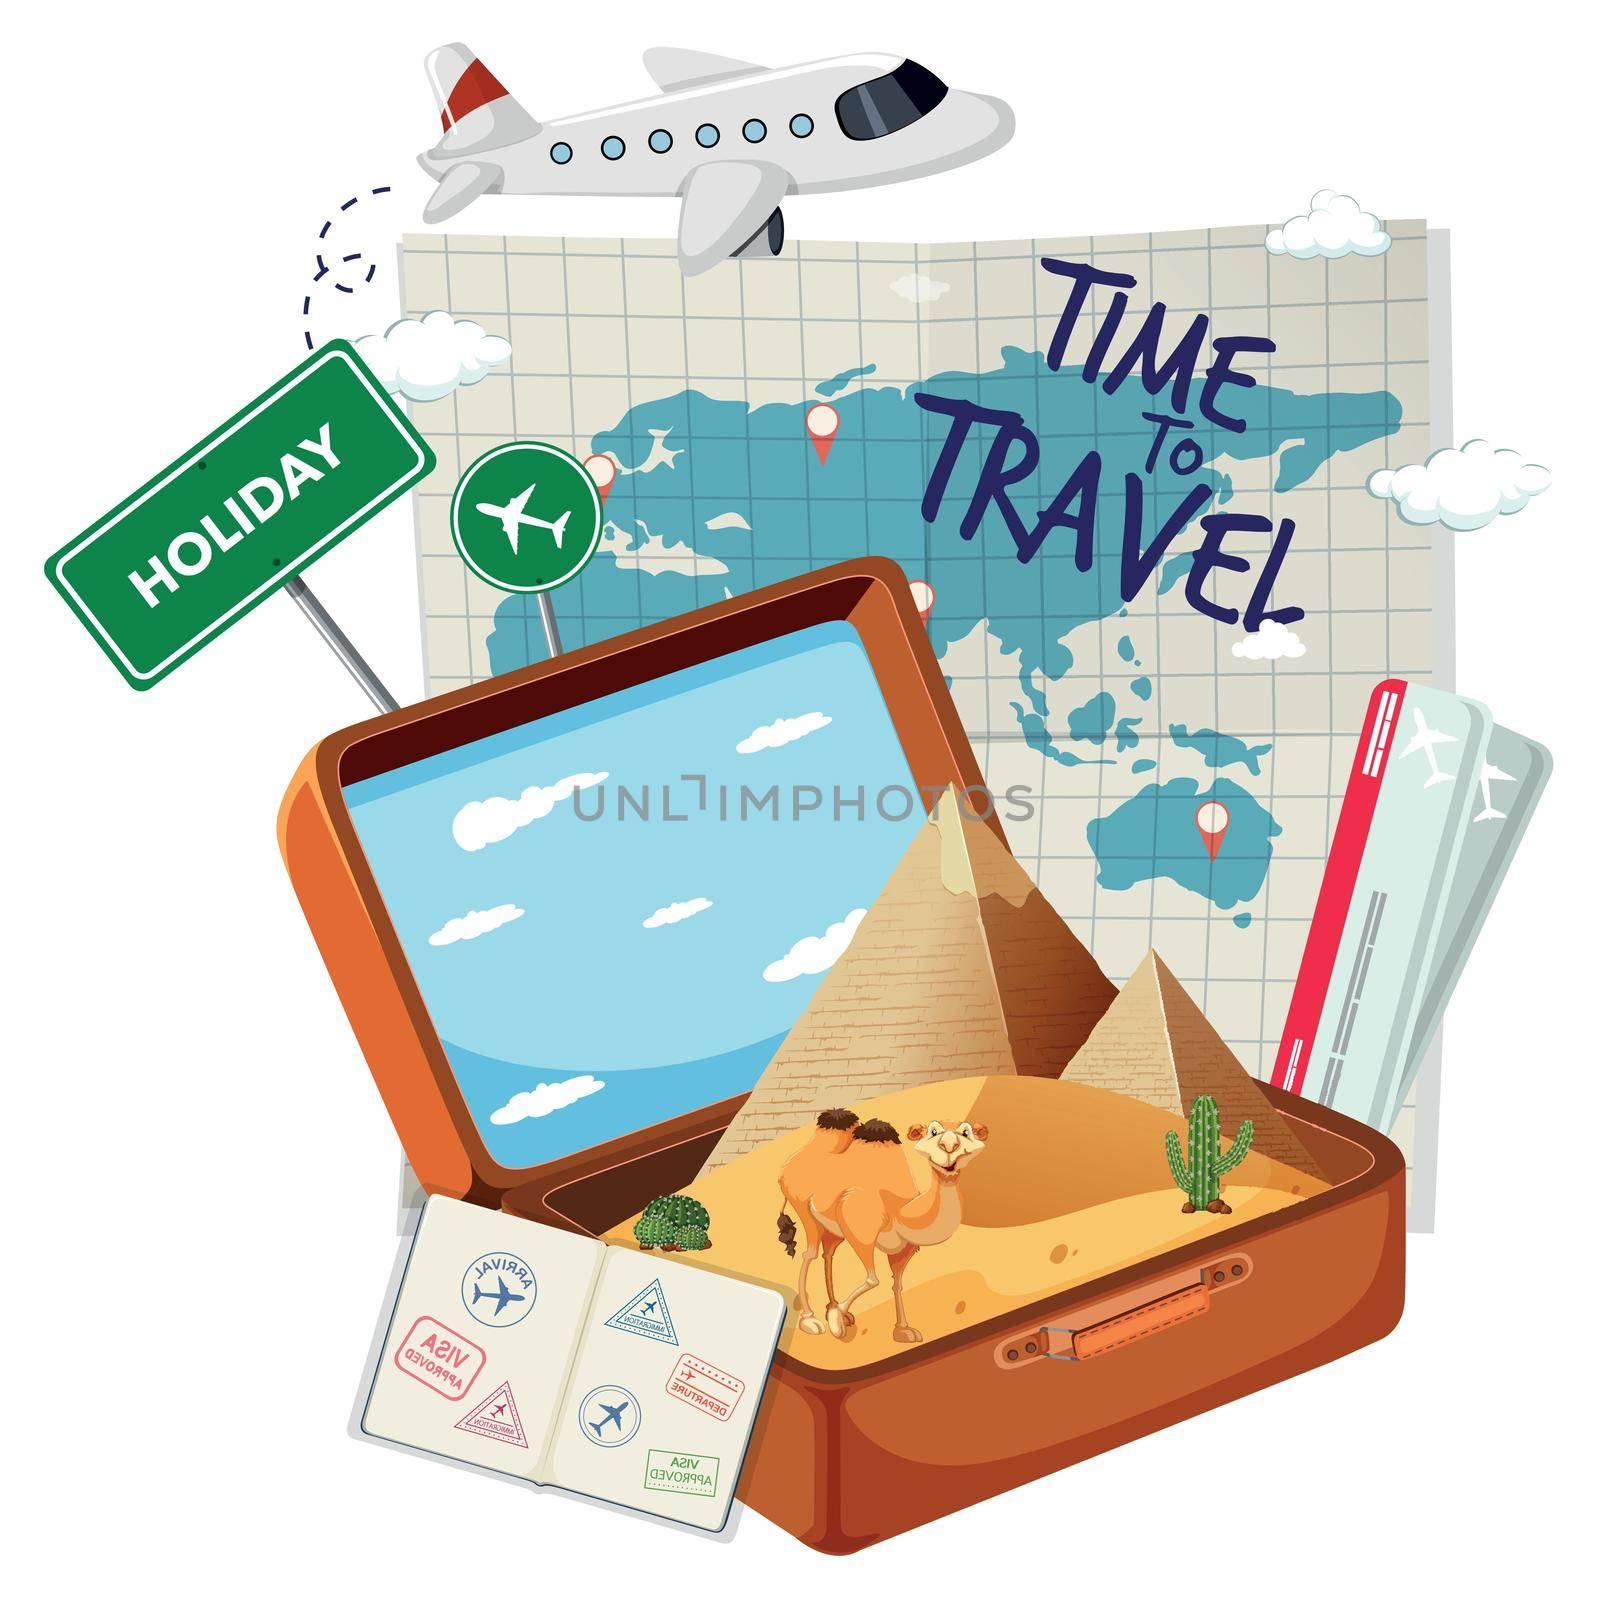 Vintage suitcase with travel element illustration